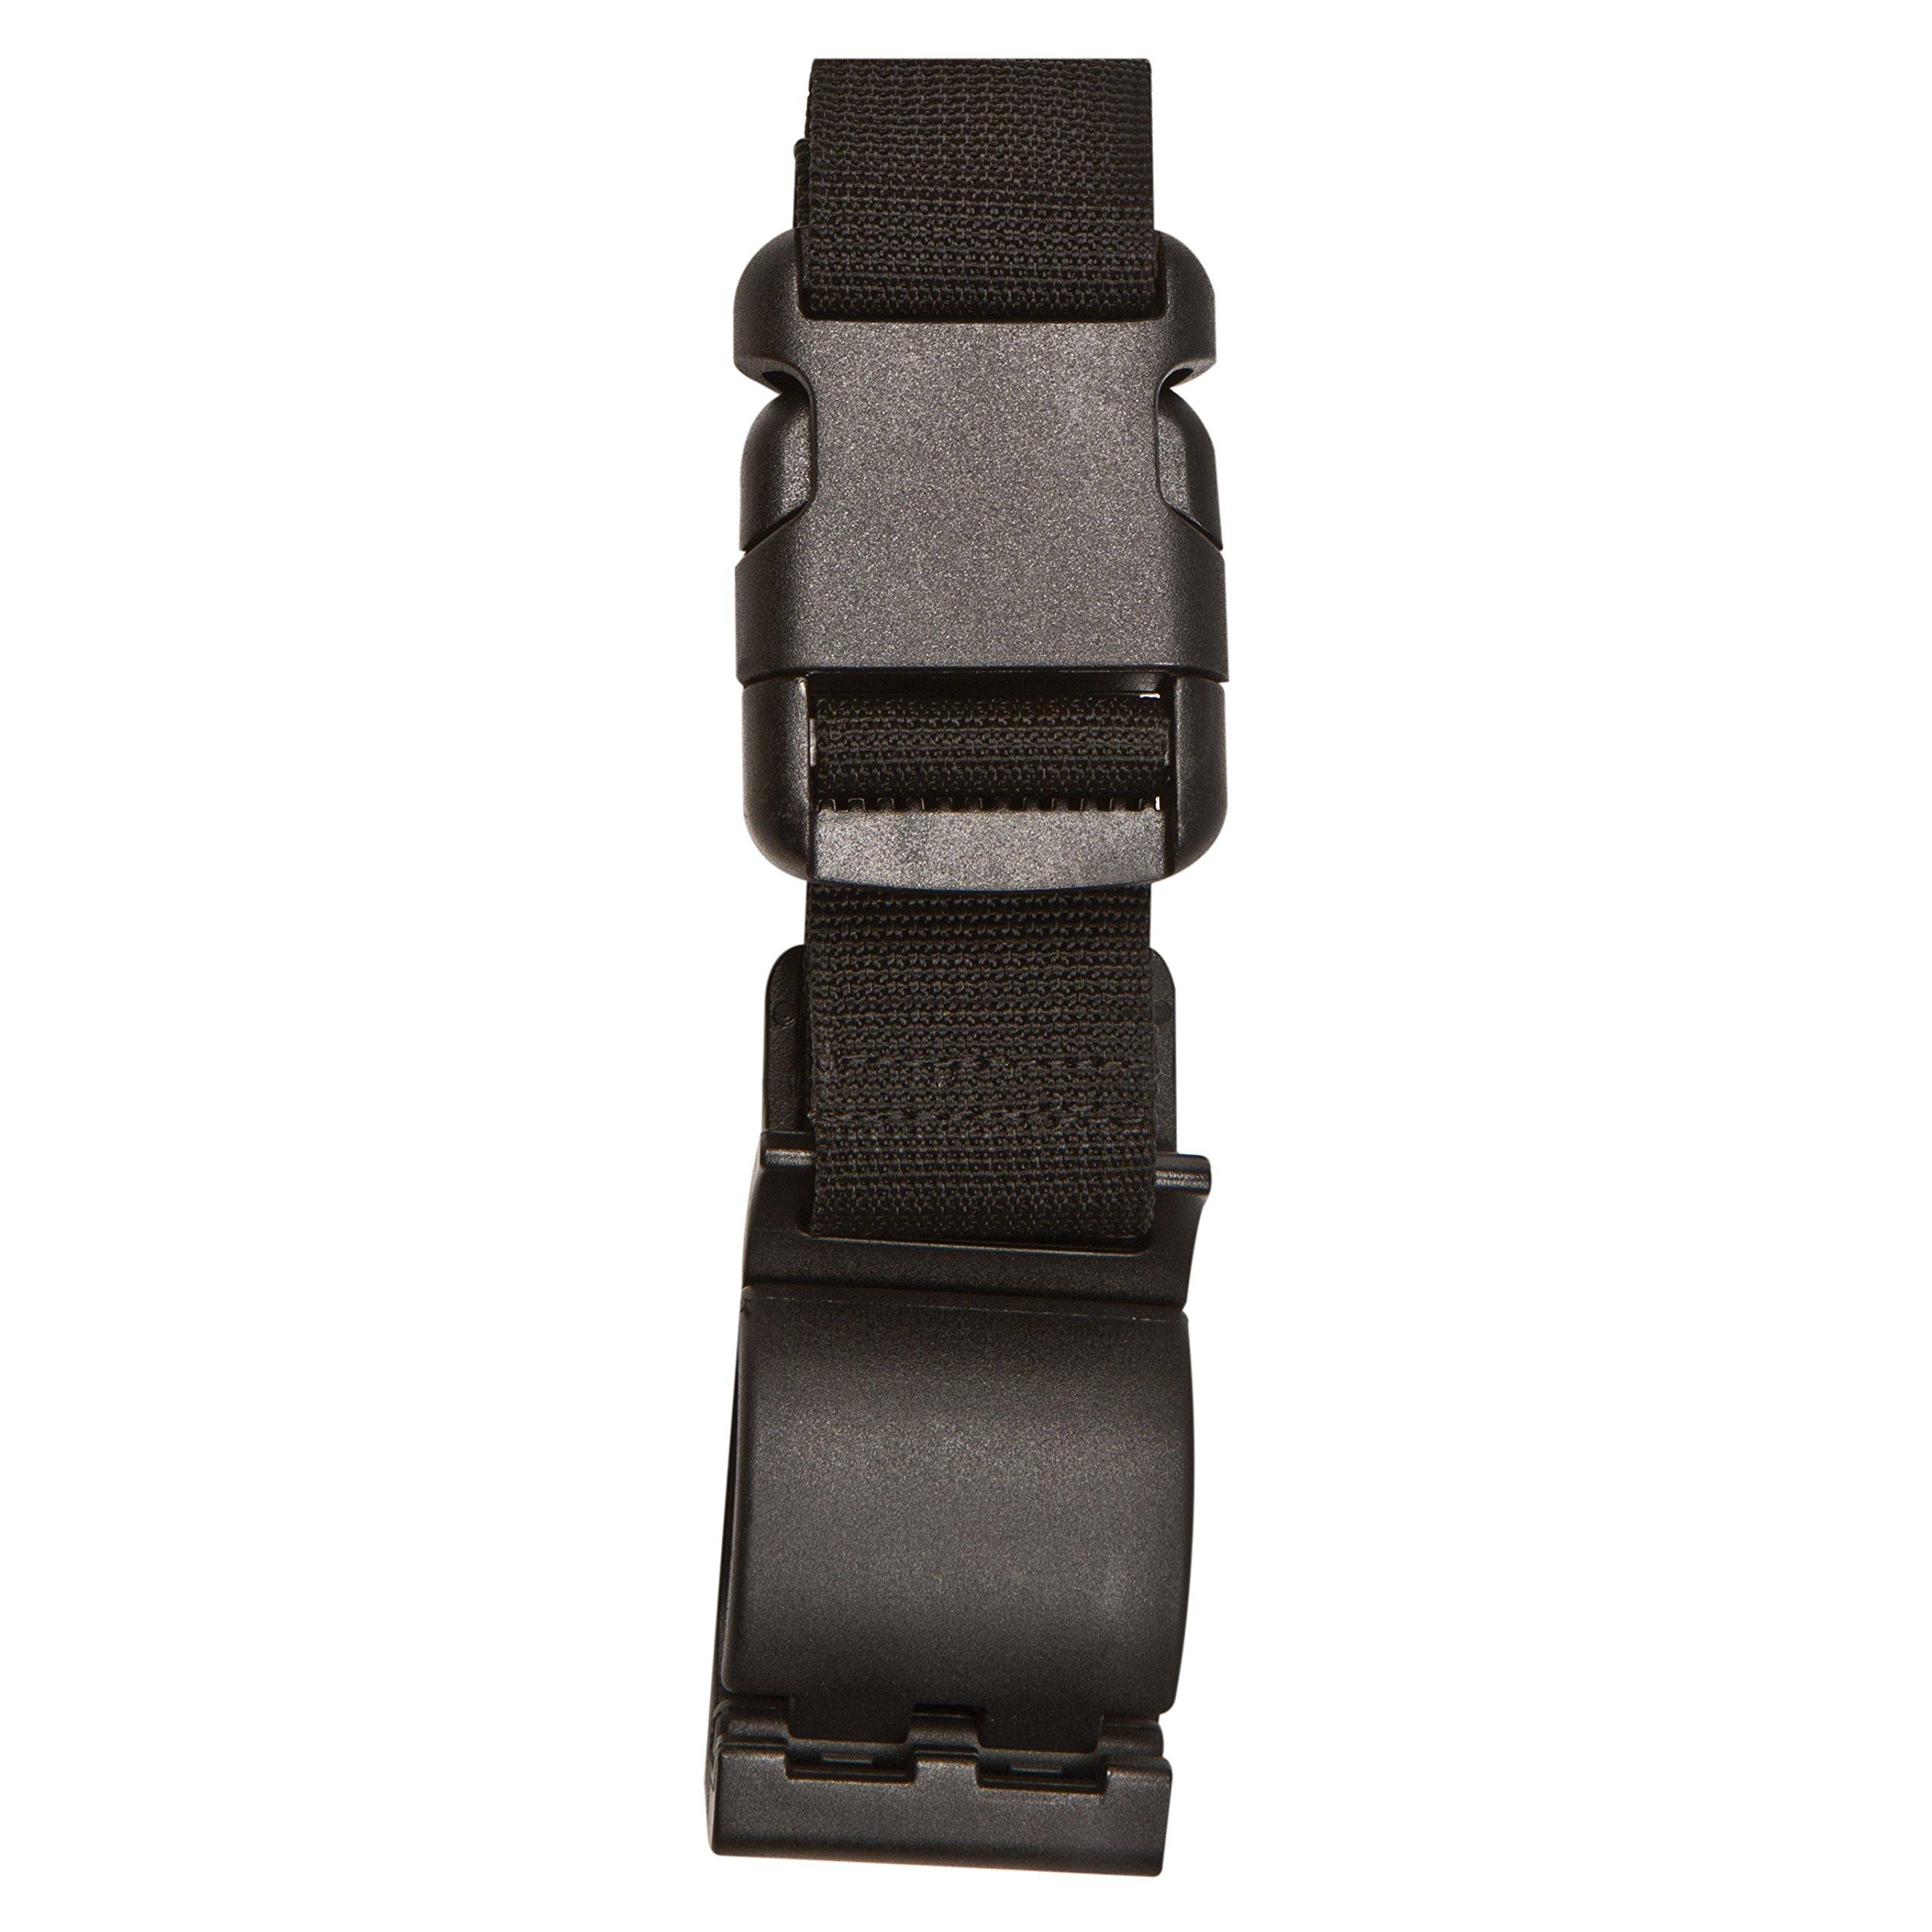 Travelon Add A Bag Strap, Black, One Size by Travelon (Image #1)